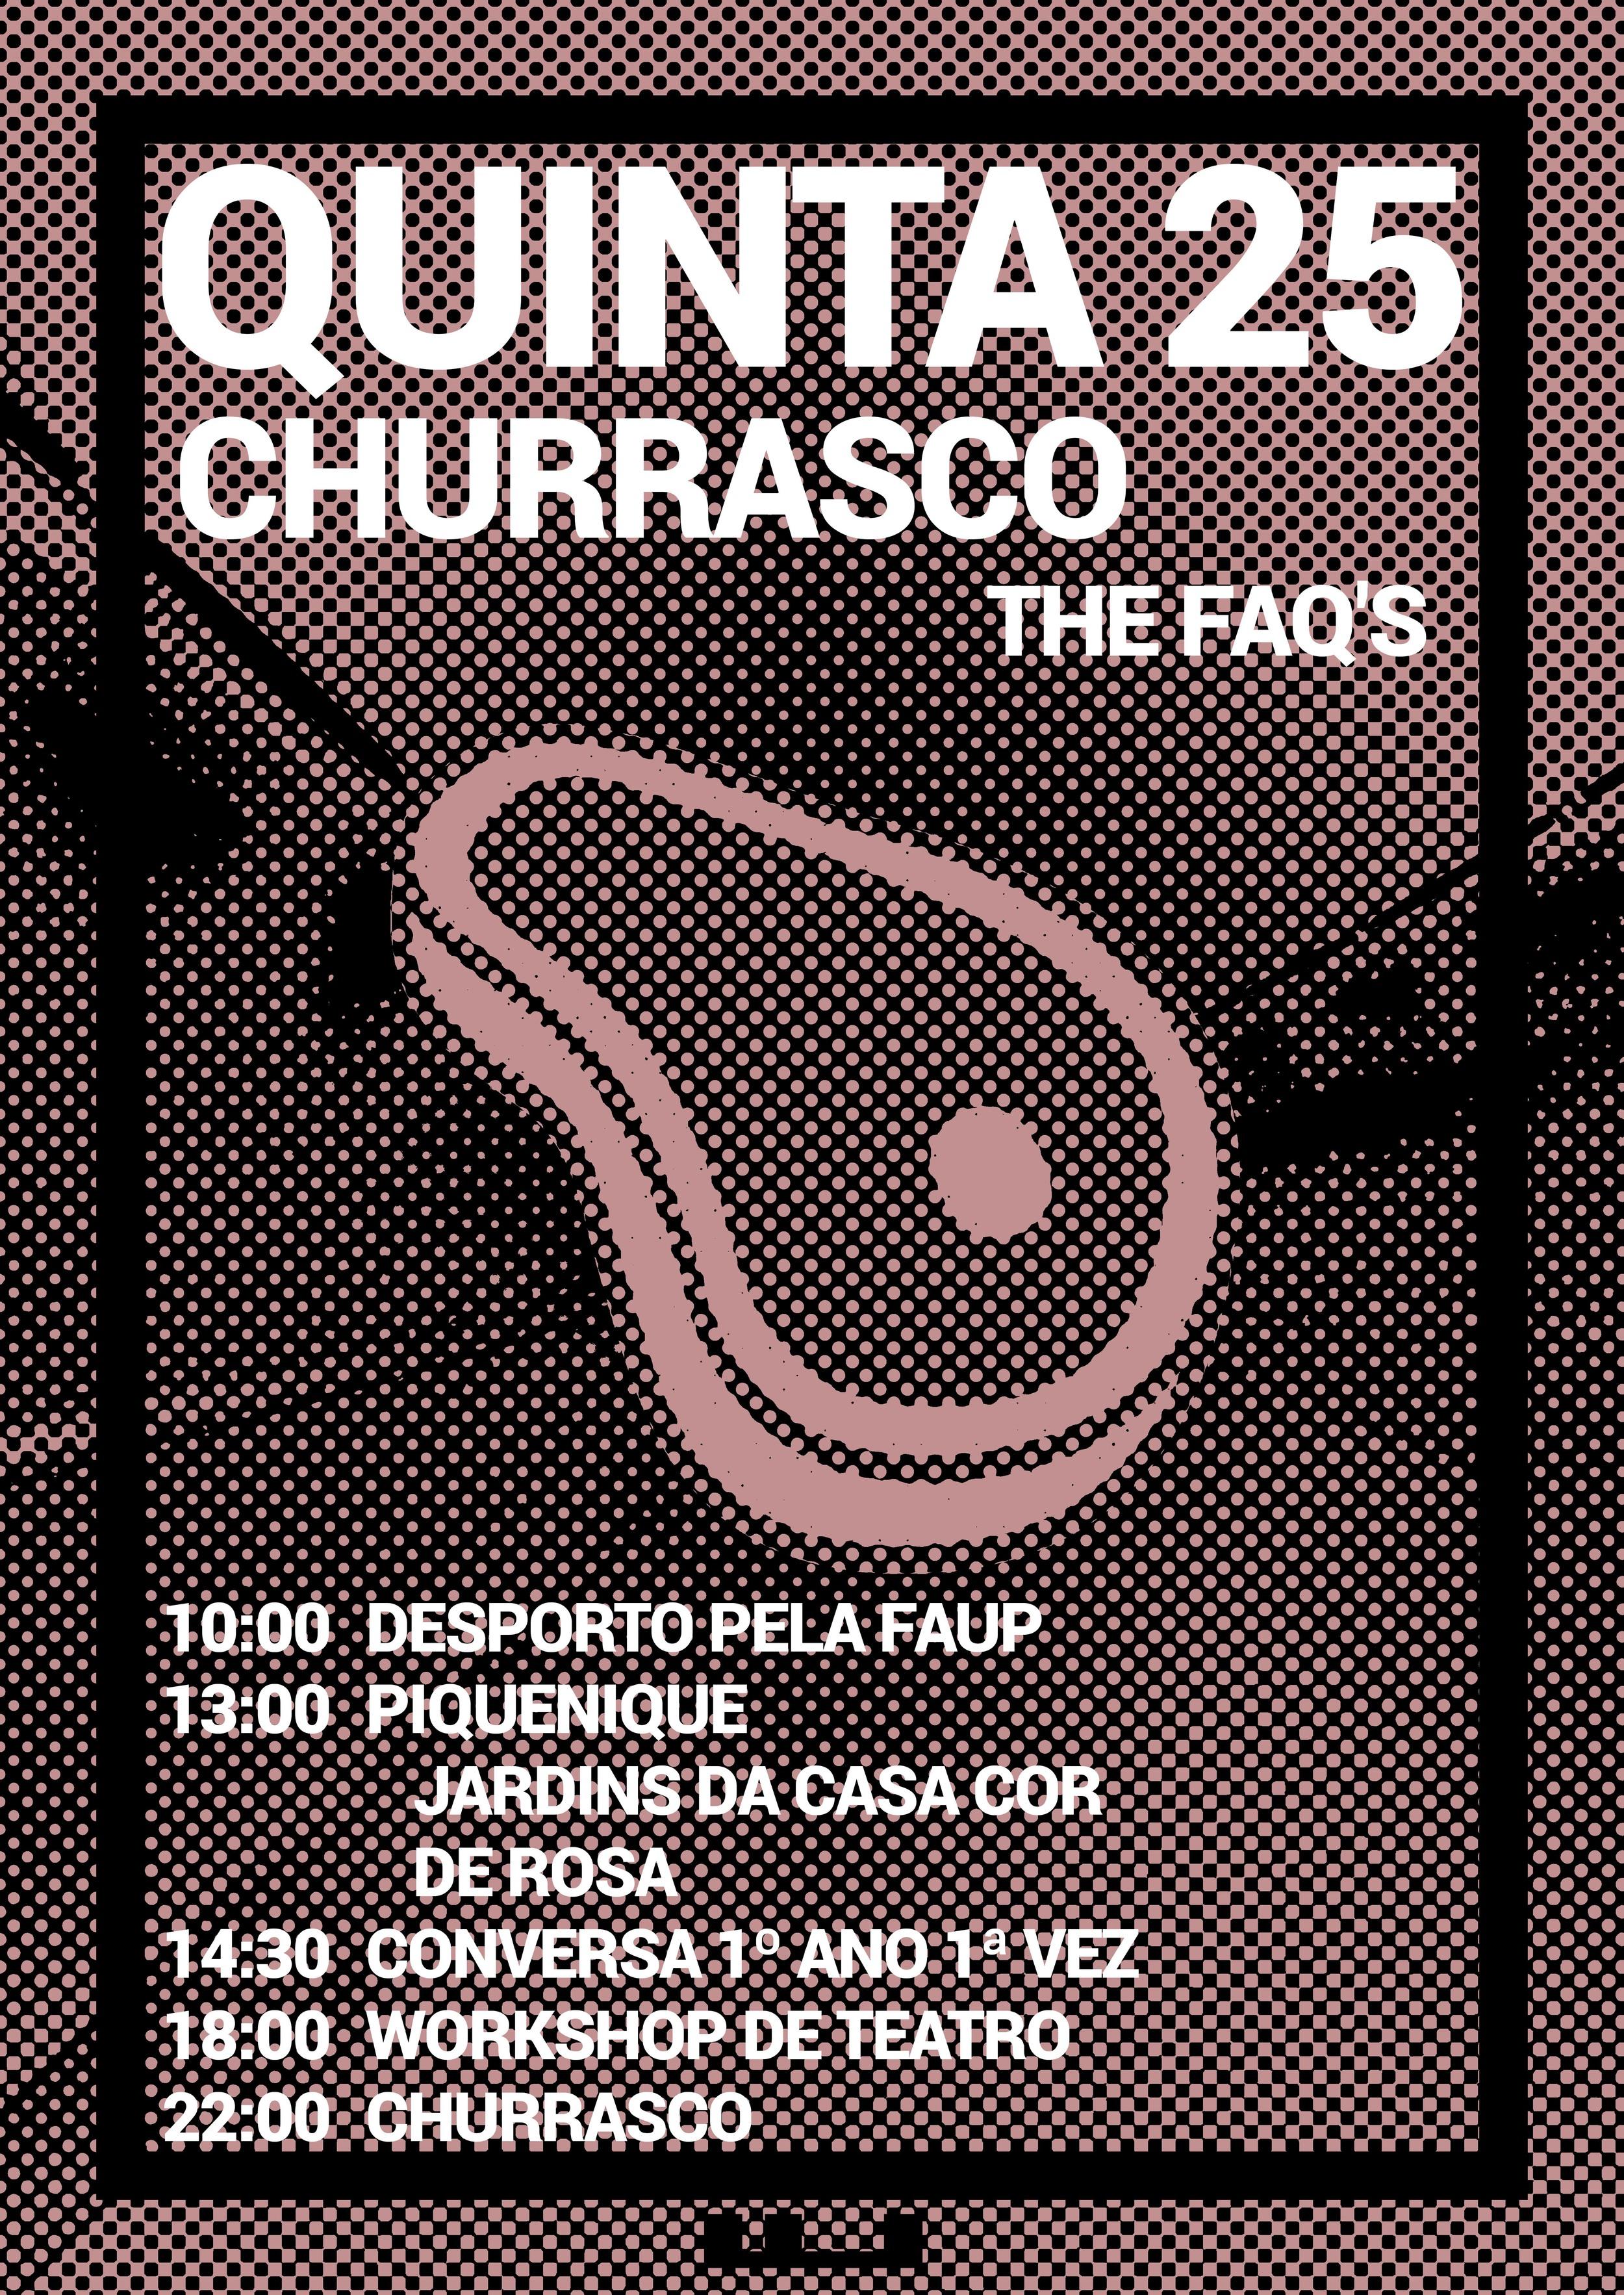 churrascop.jpg